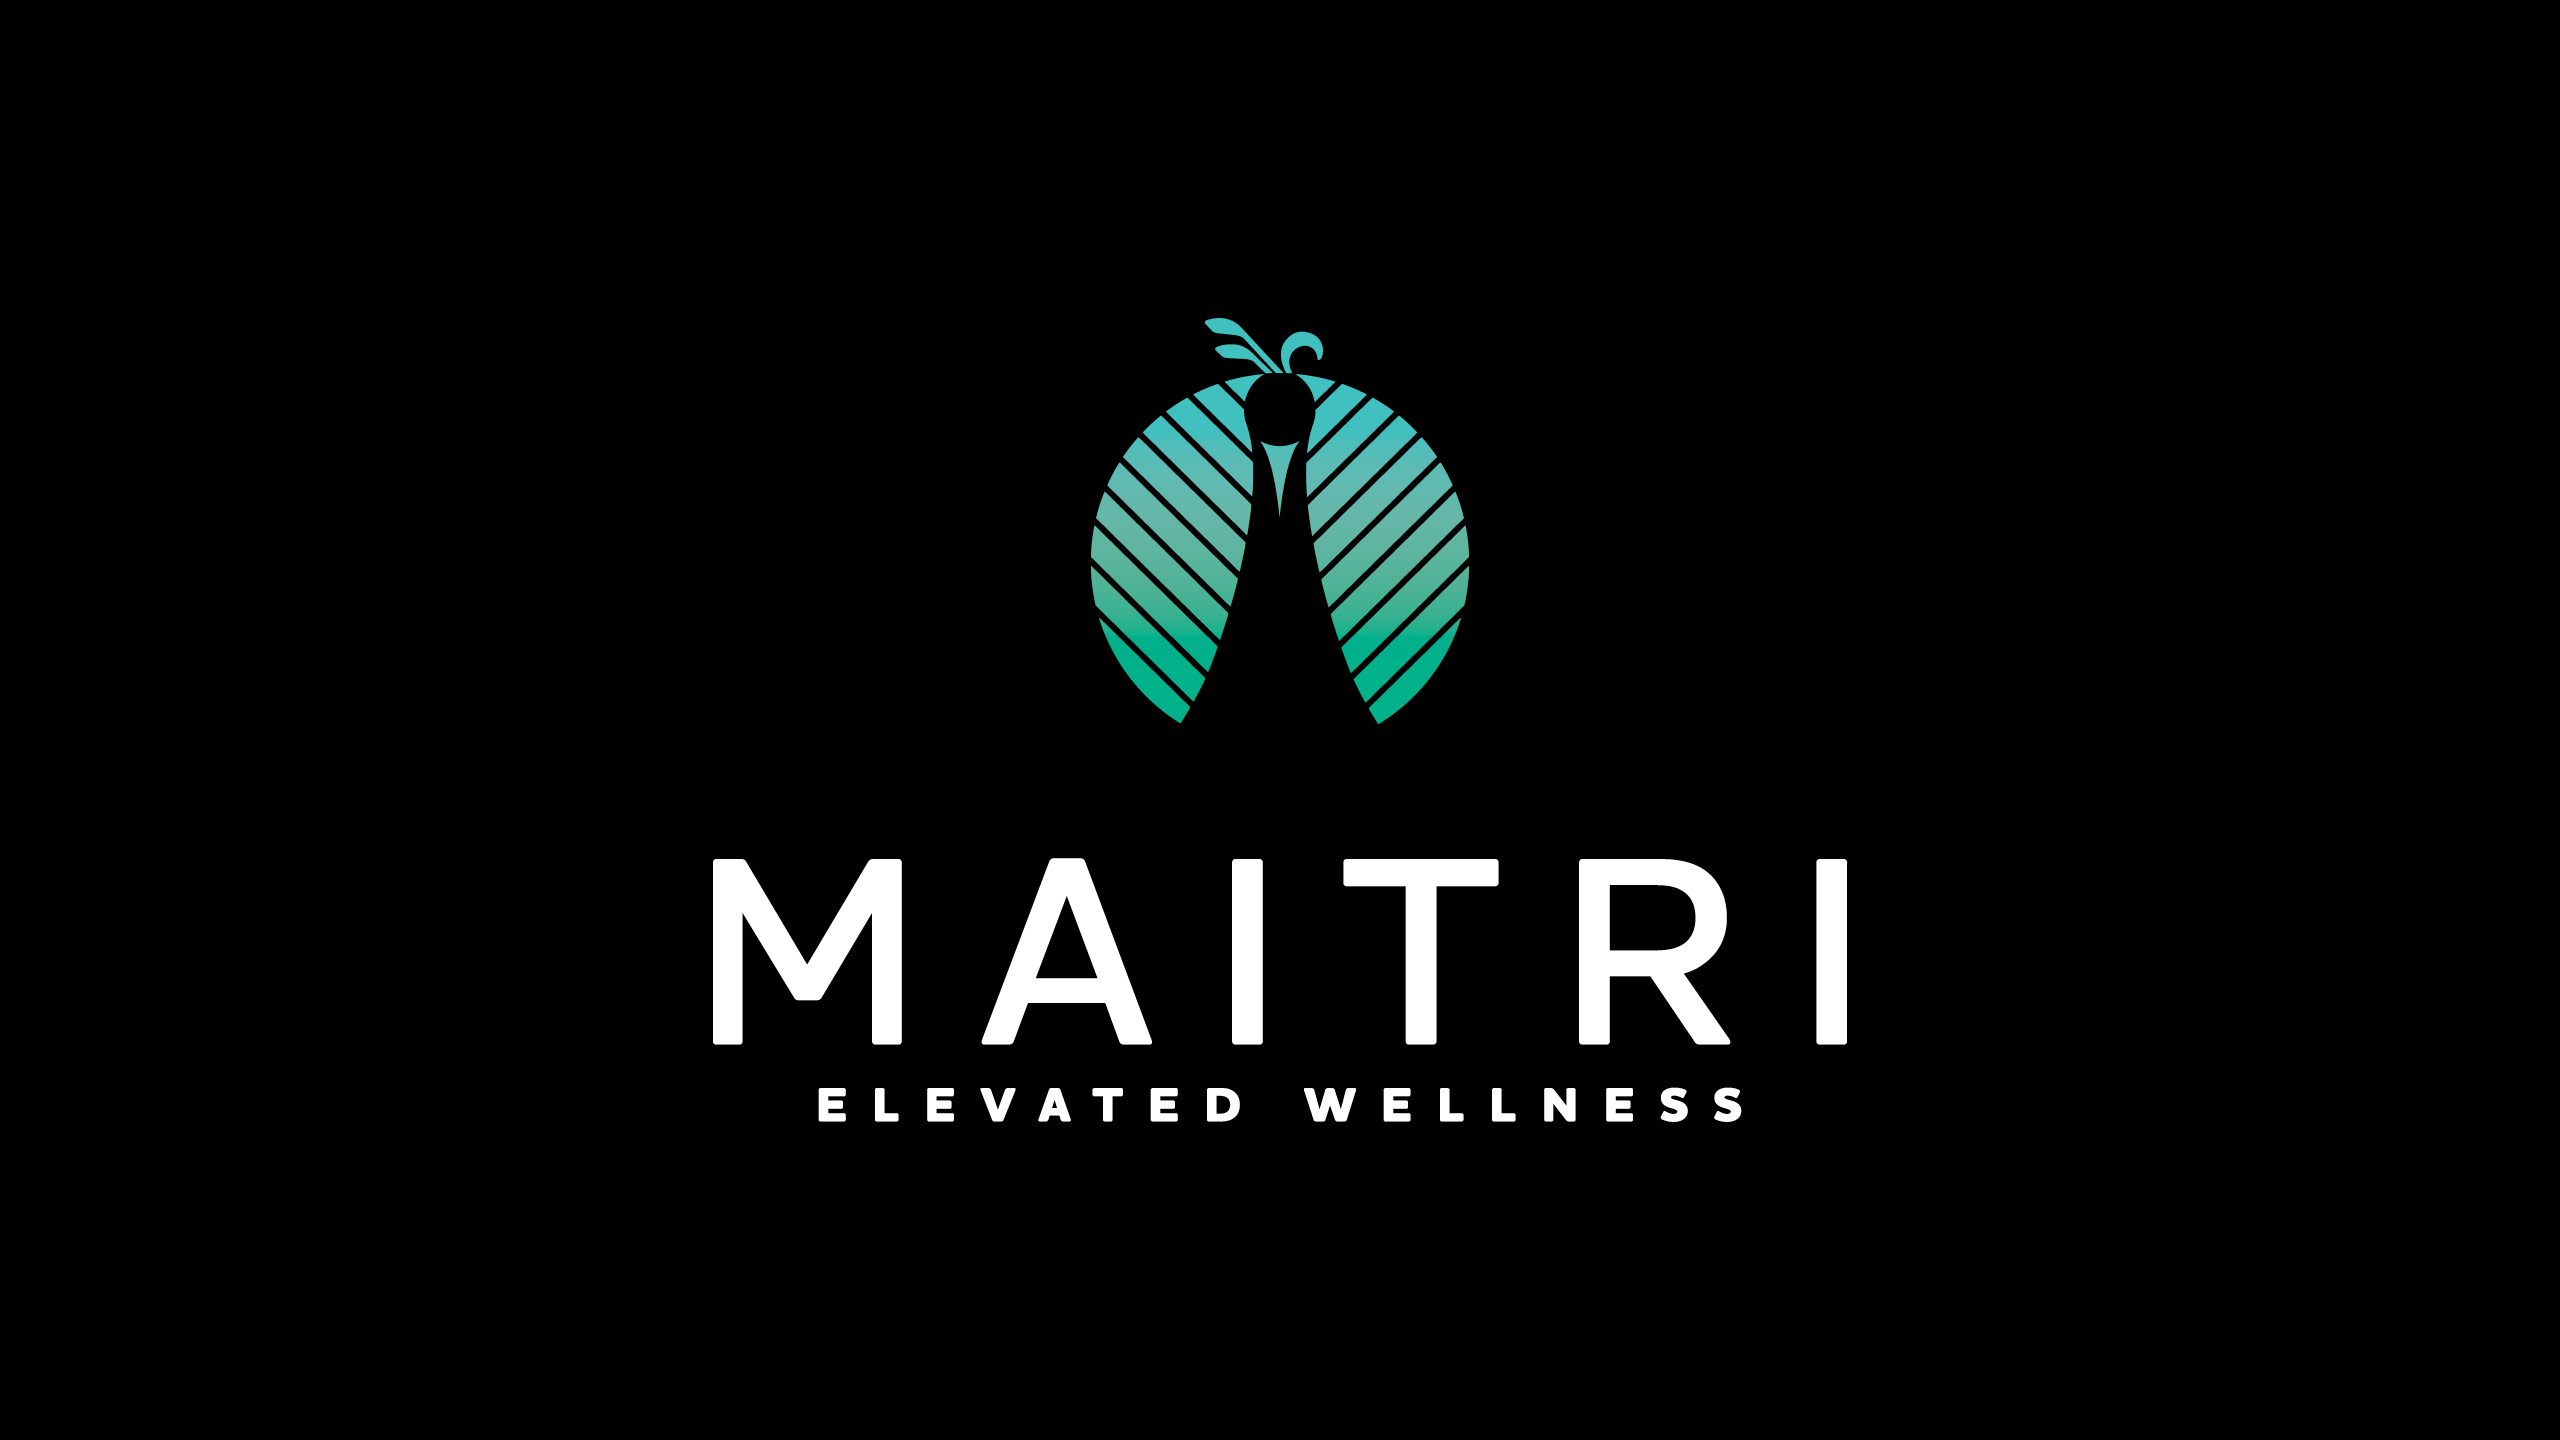 Maitri Medicinals Brand Identity & Logo Creation by High Road Design Studio